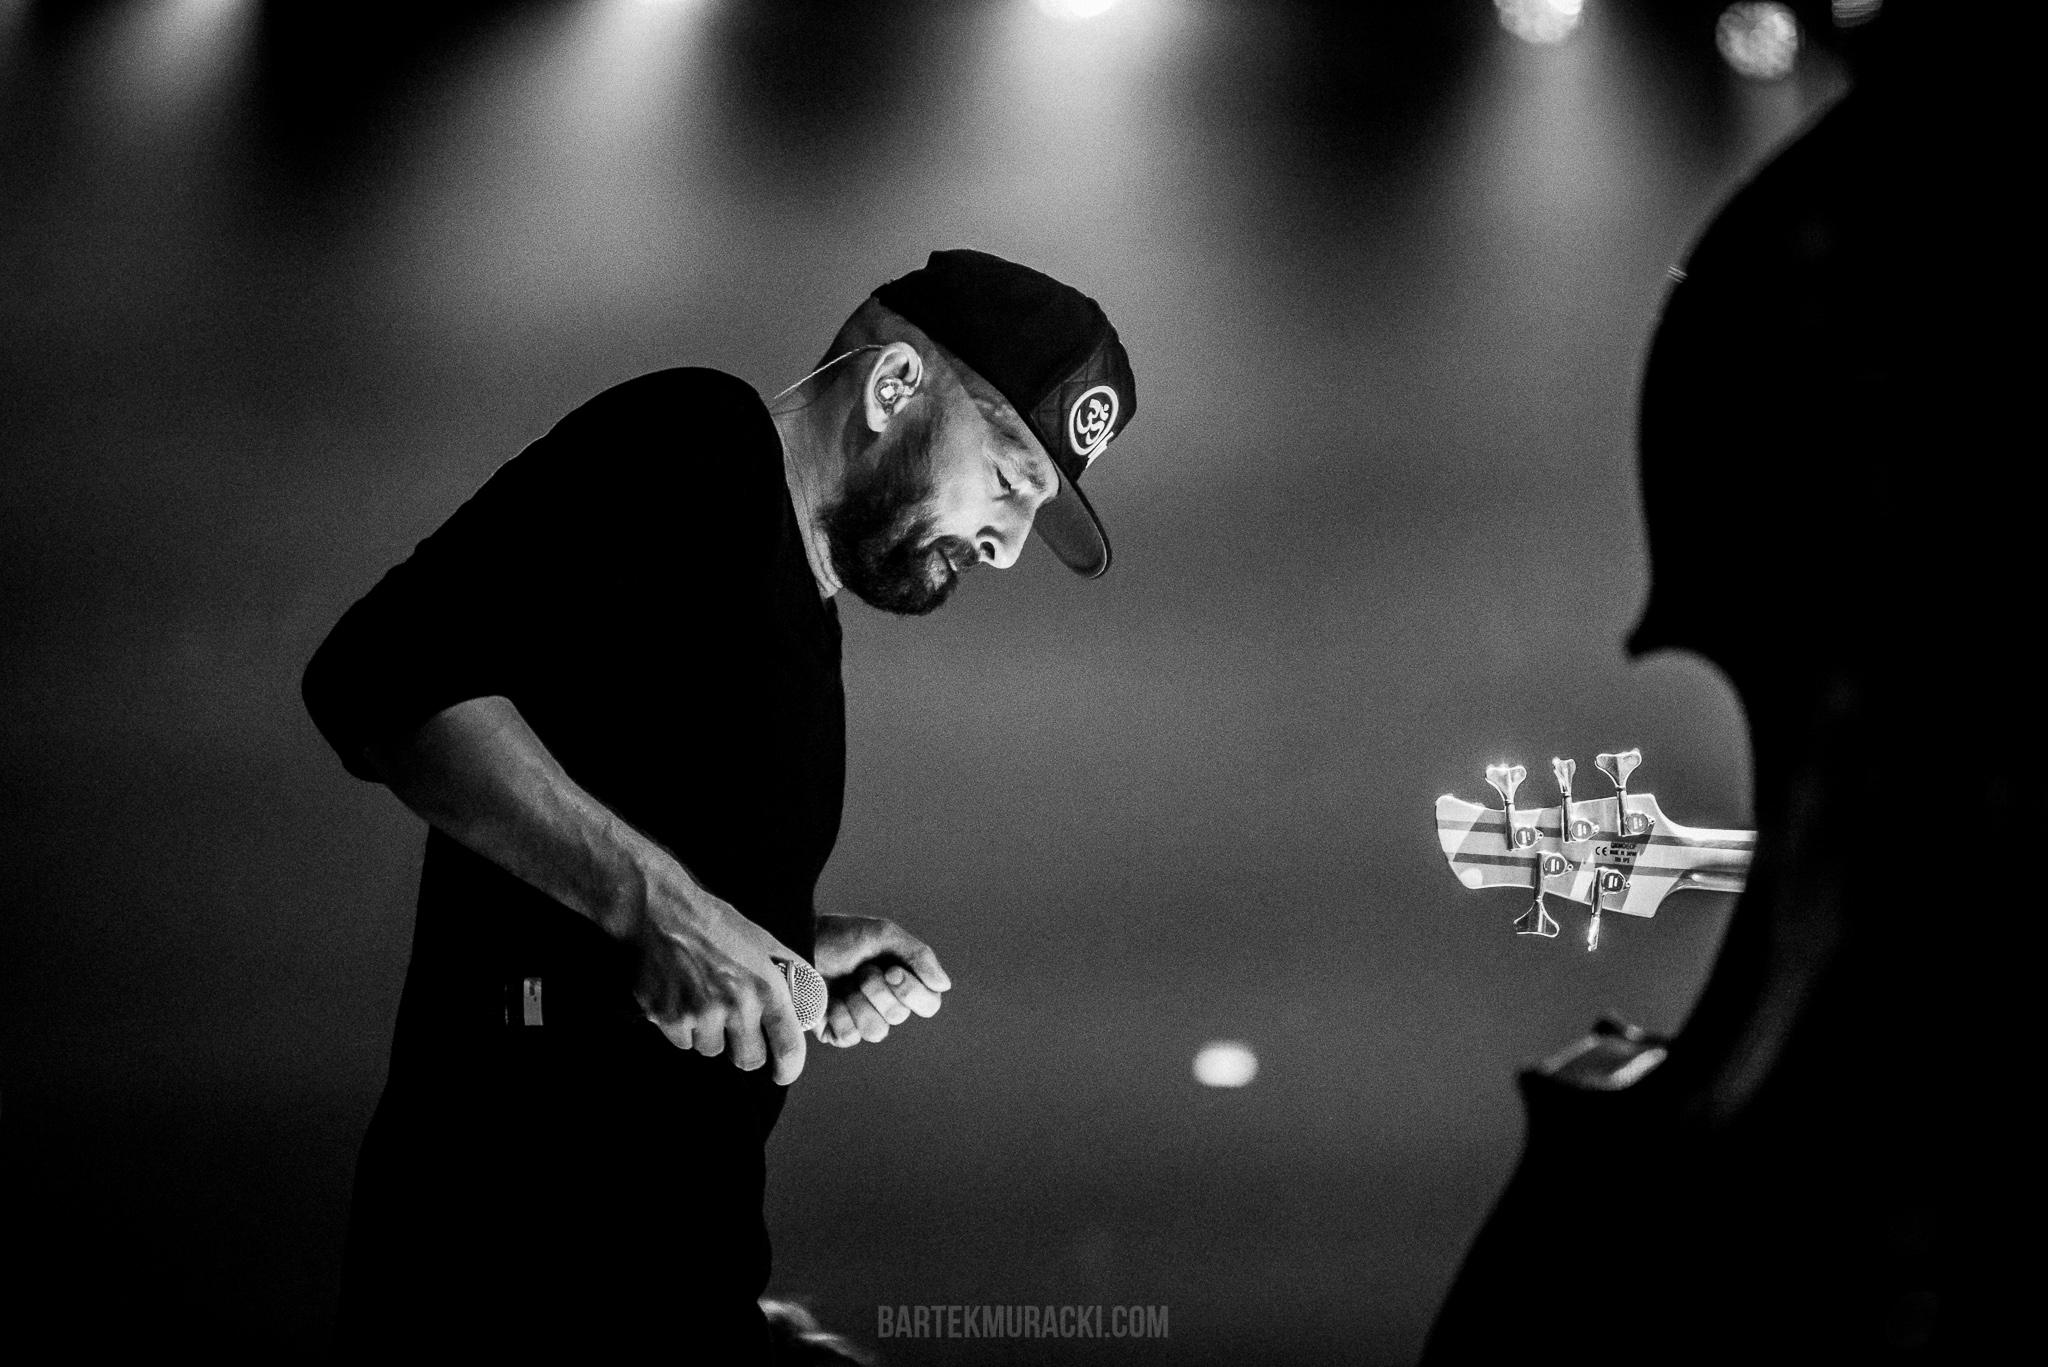 Gentleman-MTV-Unplugged-Spotkania-Kultur-fot-Bartek-Muracki-04-2545